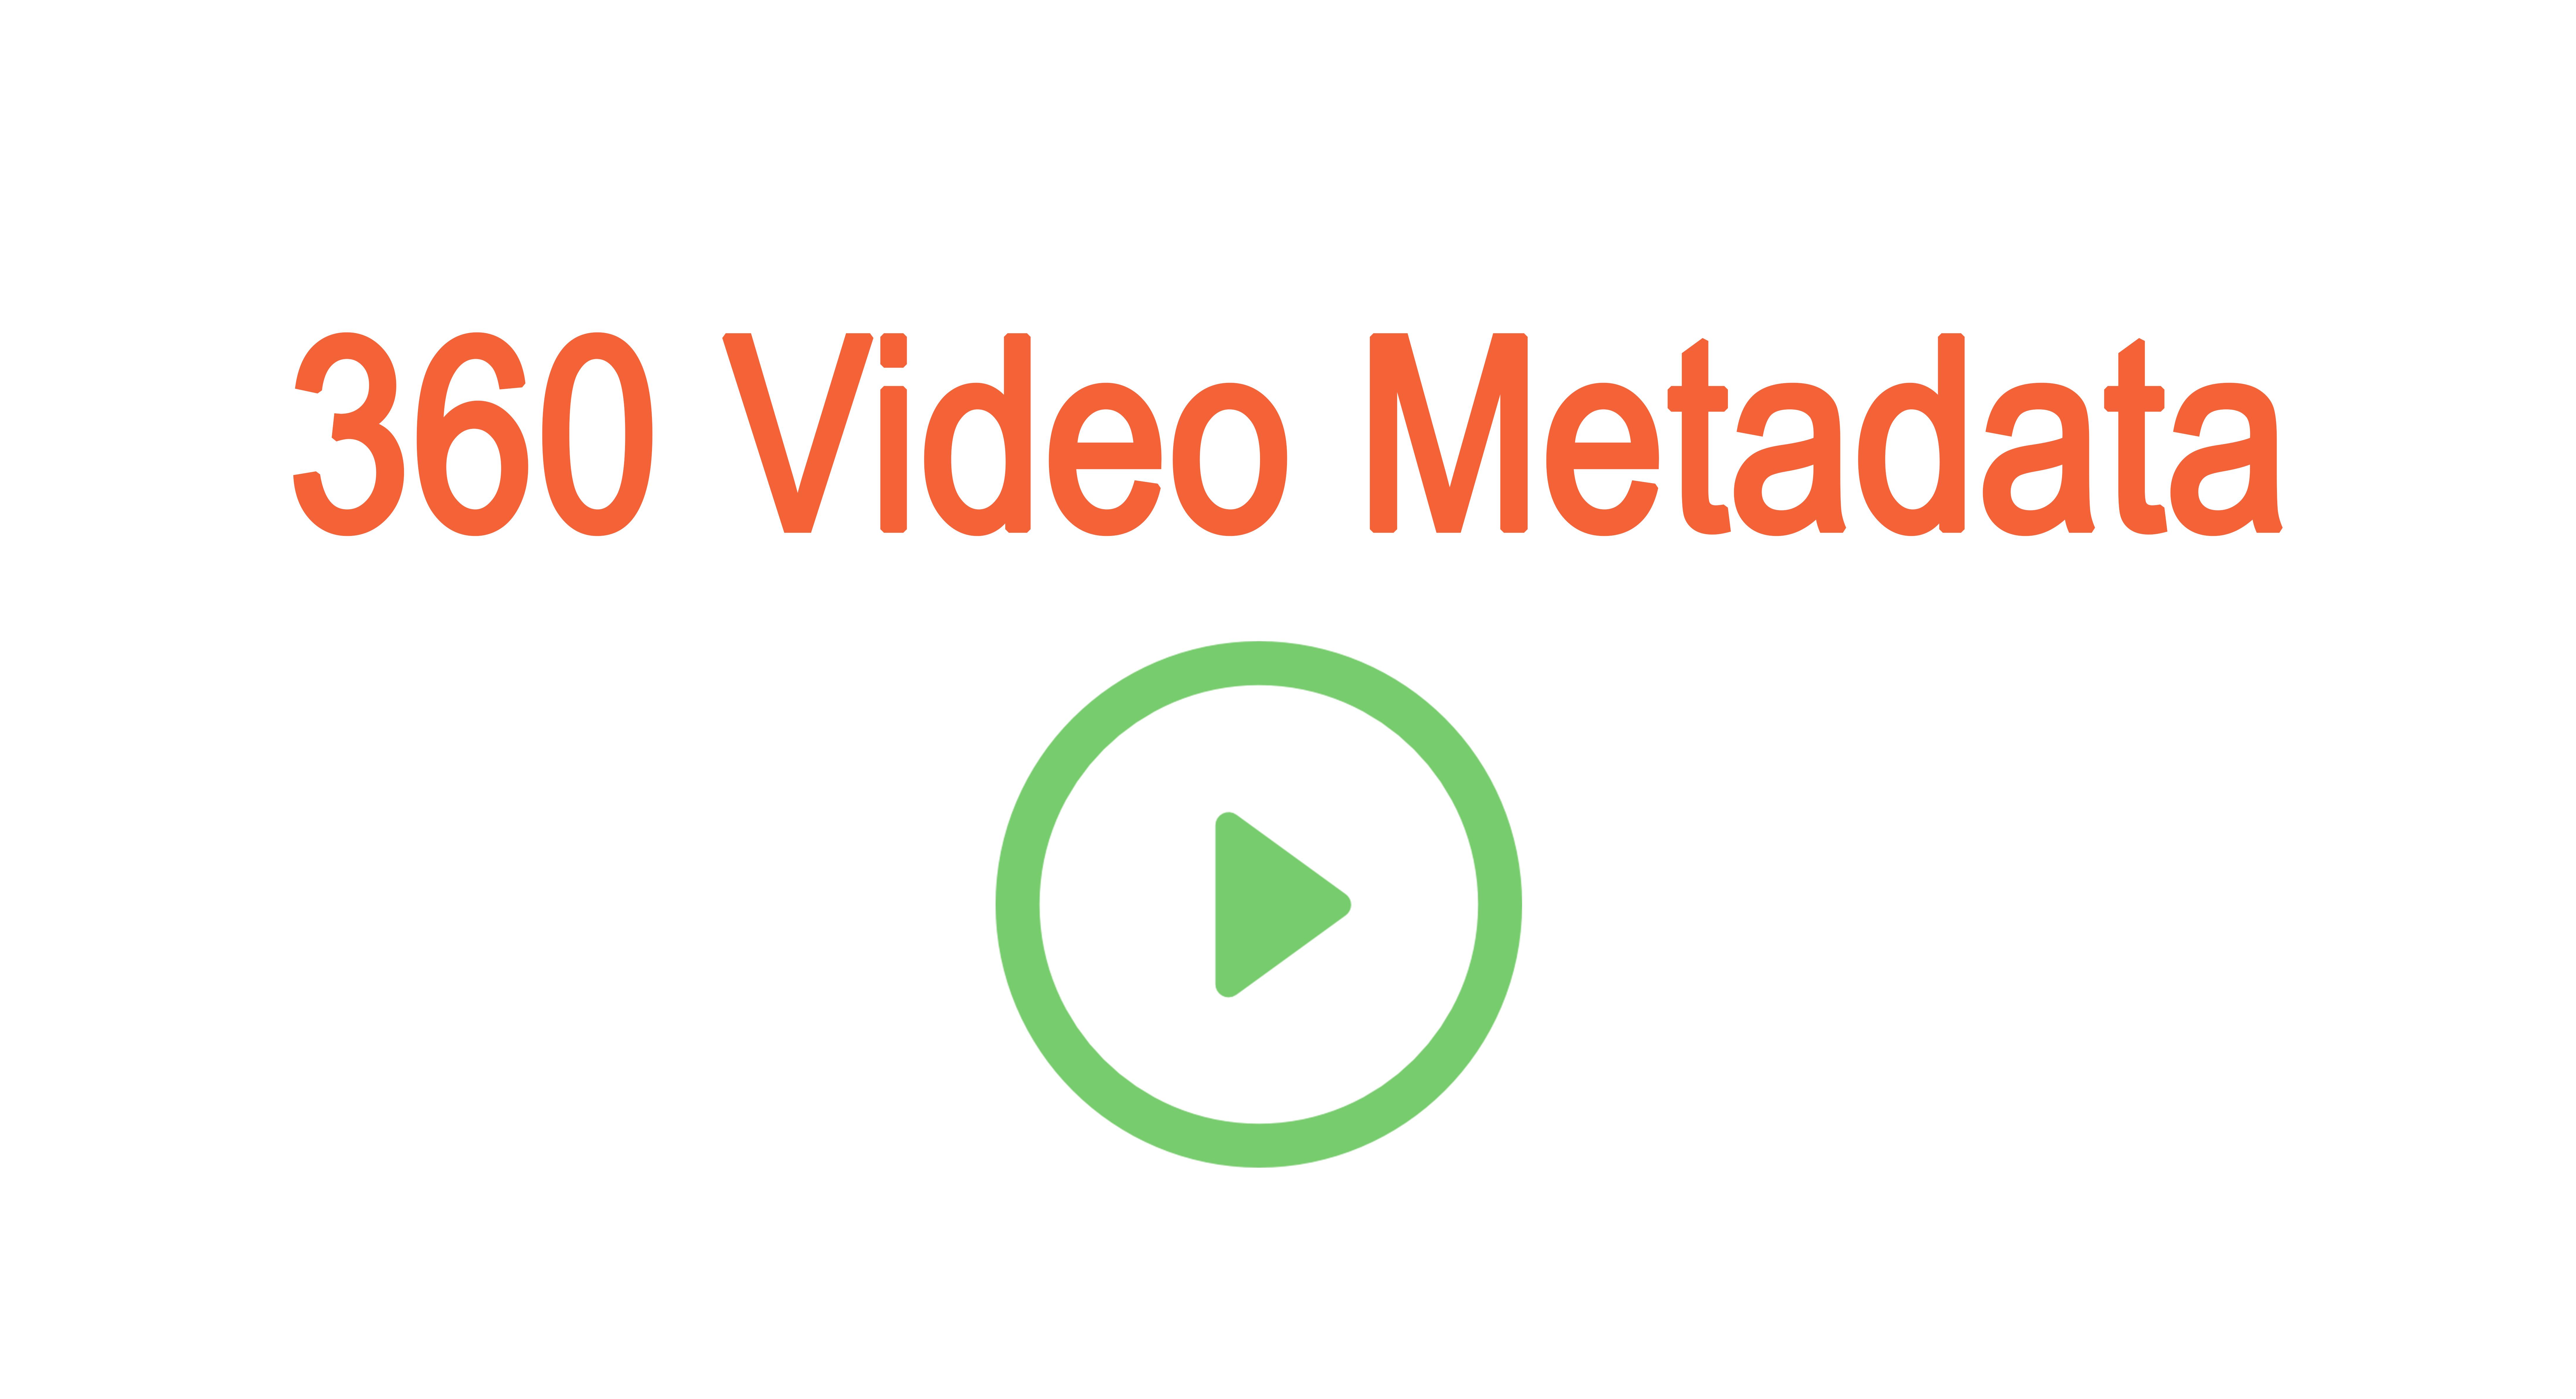 360 video metadata